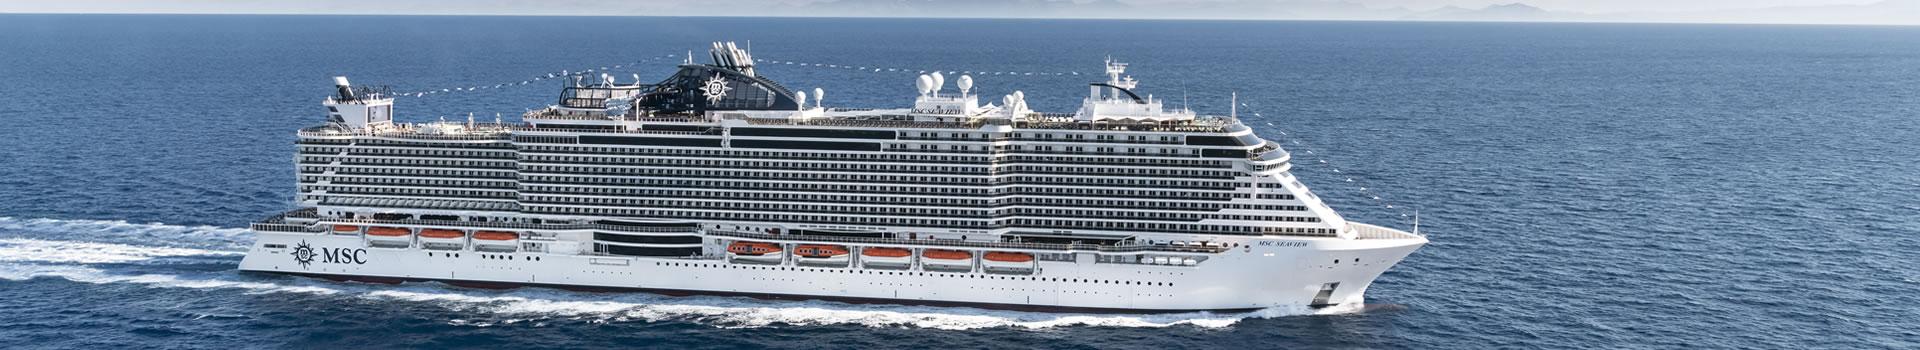 Photo and Video gallery MSC Seaview, MSC Cruises - Logitravel